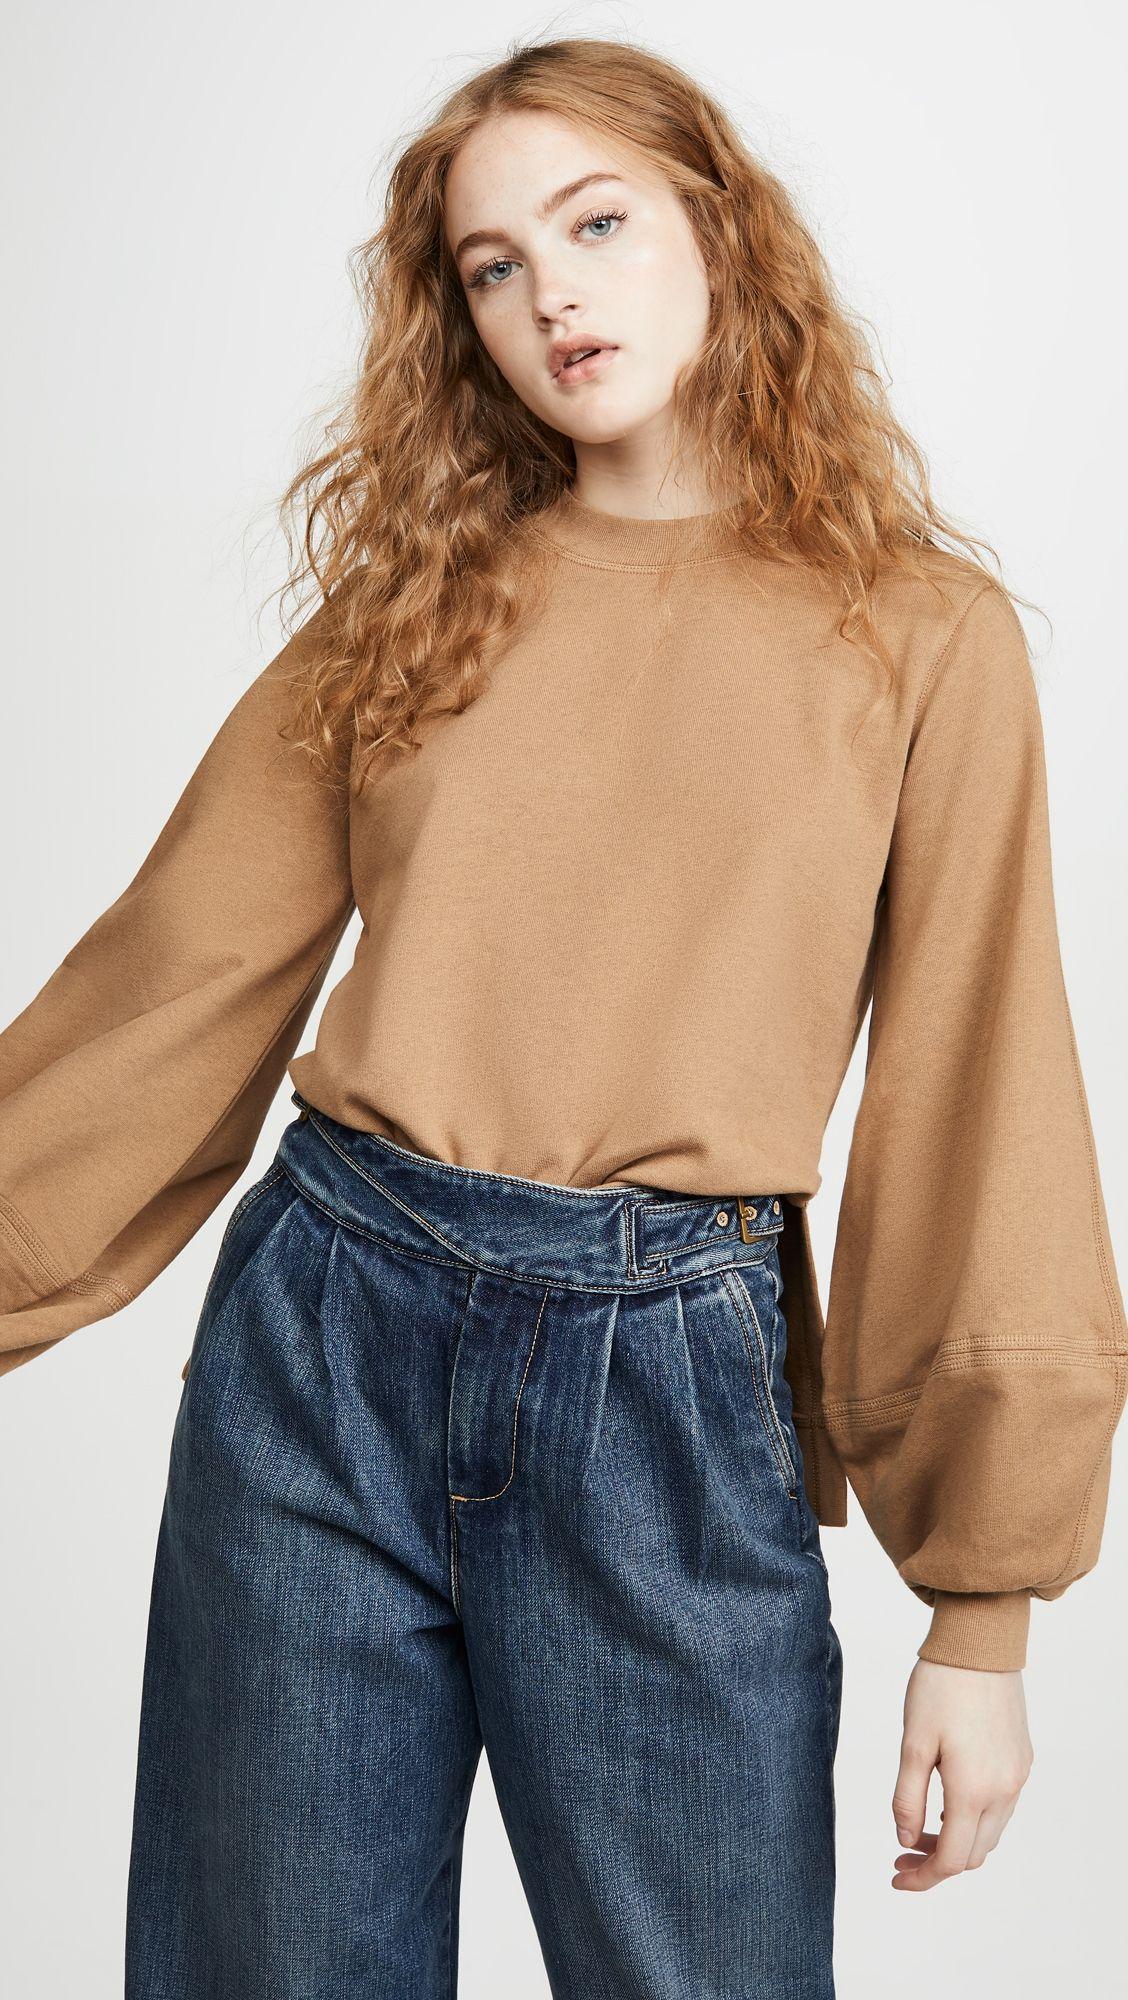 Ganni Isoli Sweatshirt Shopbop Black Friday Save 20 On Orders 200 Womens Tops Sweatshirts Elle Style Awards [ 2000 x 1128 Pixel ]